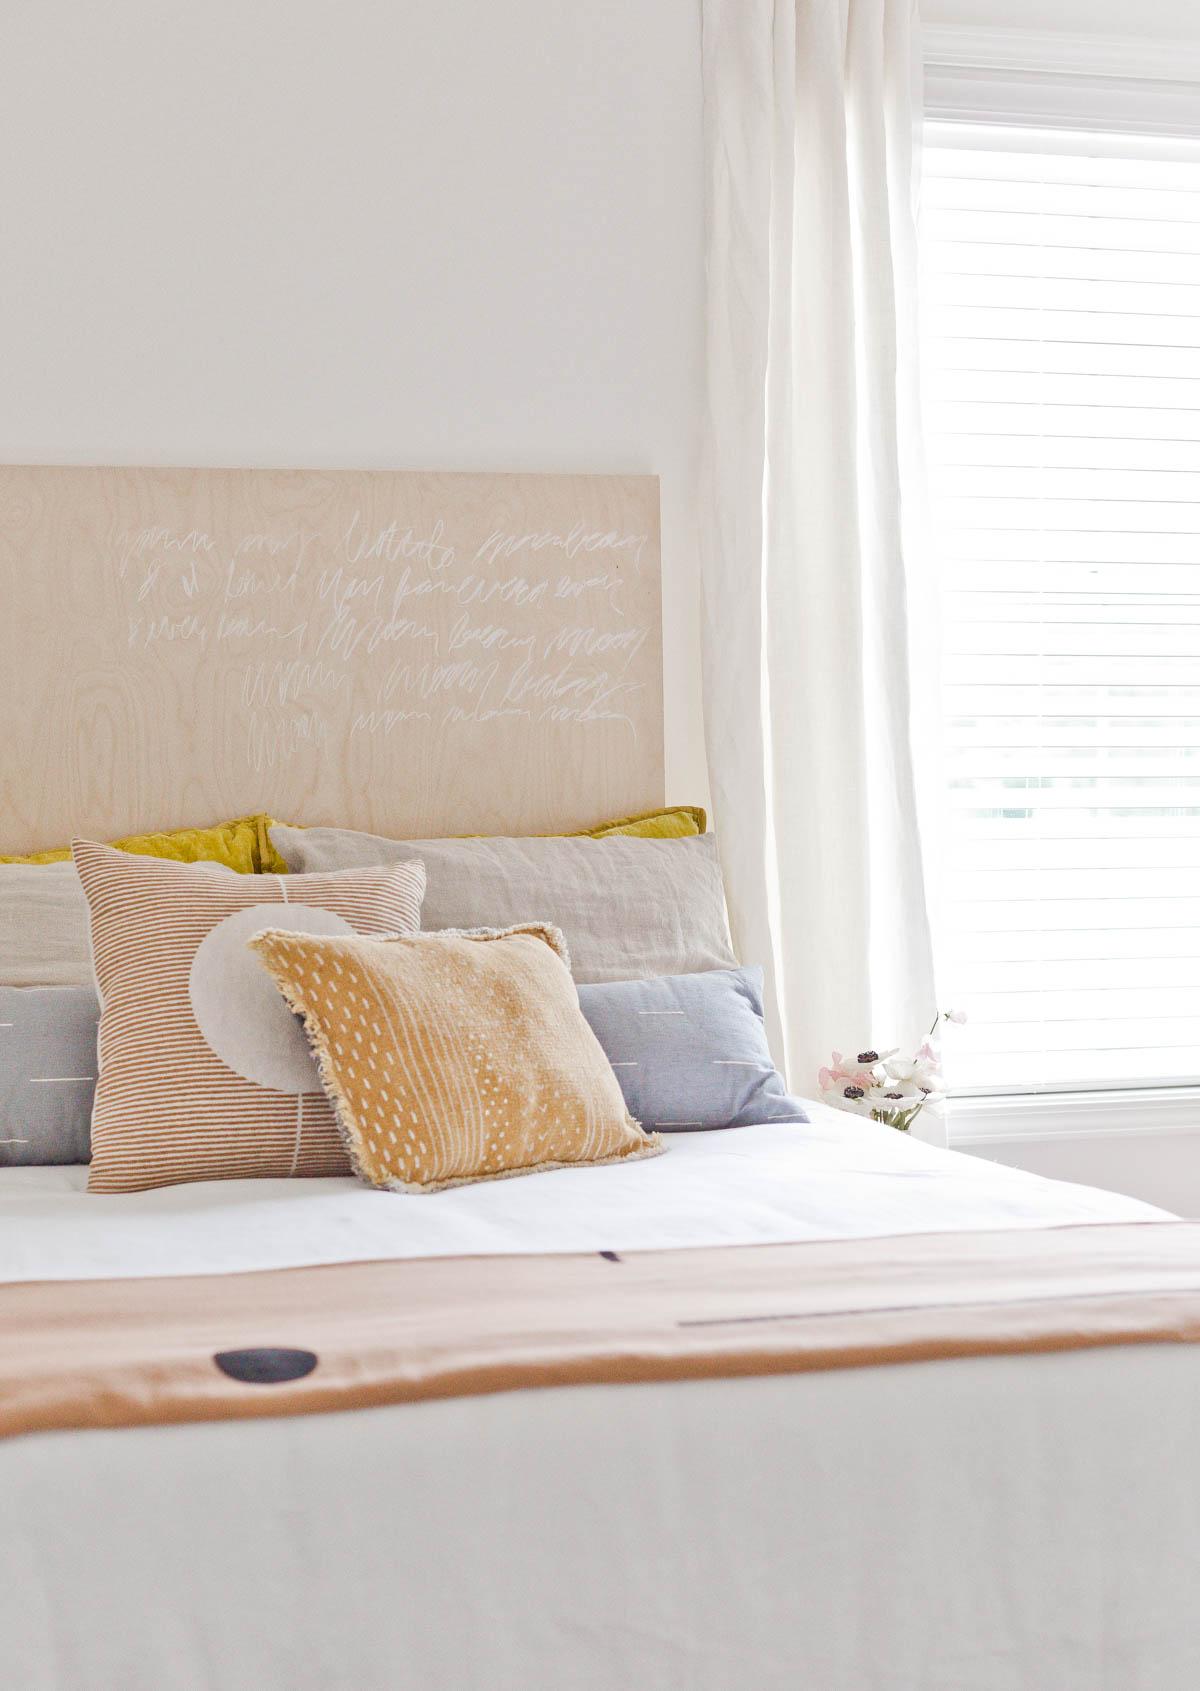 Design-Crush-SeventhandOak-Renter-Friendly-Room-Office6.jpg